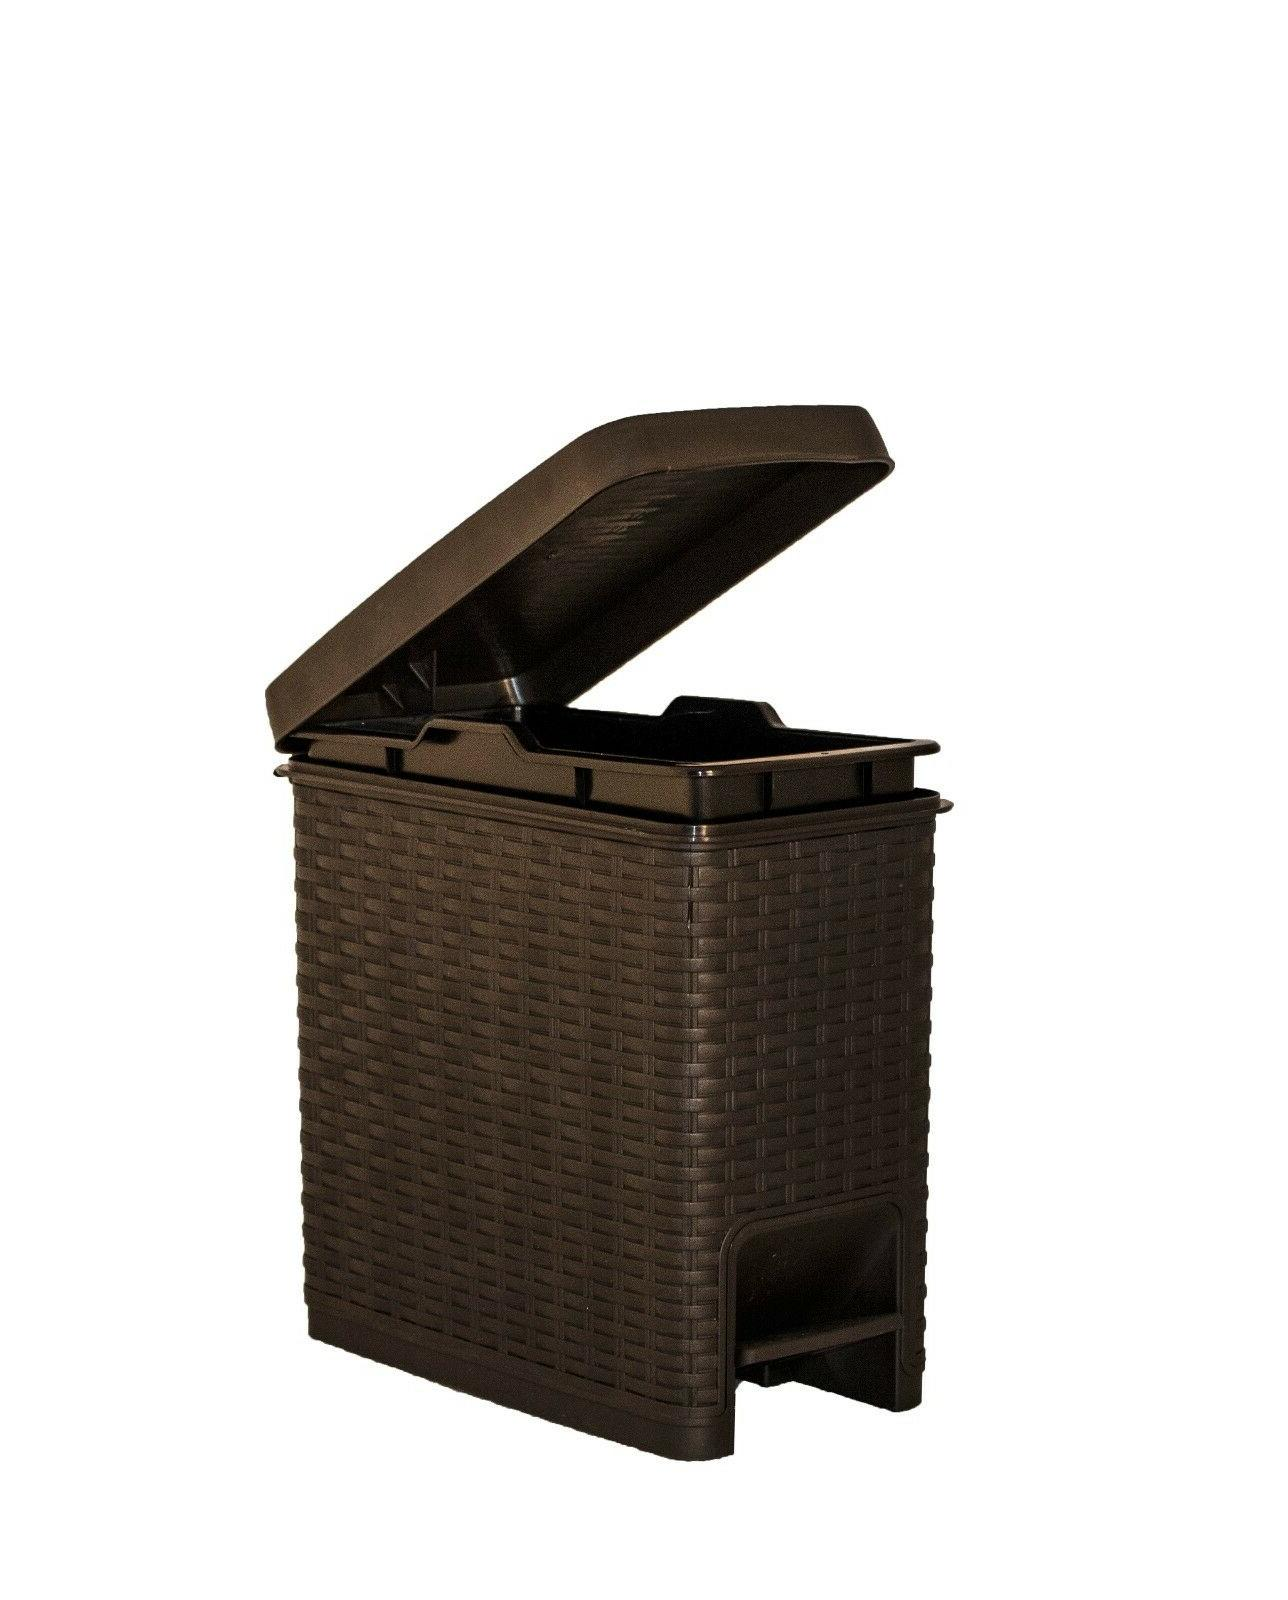 Superio Slim Trash Can Rattan Style 6.5 Qt.- Brown